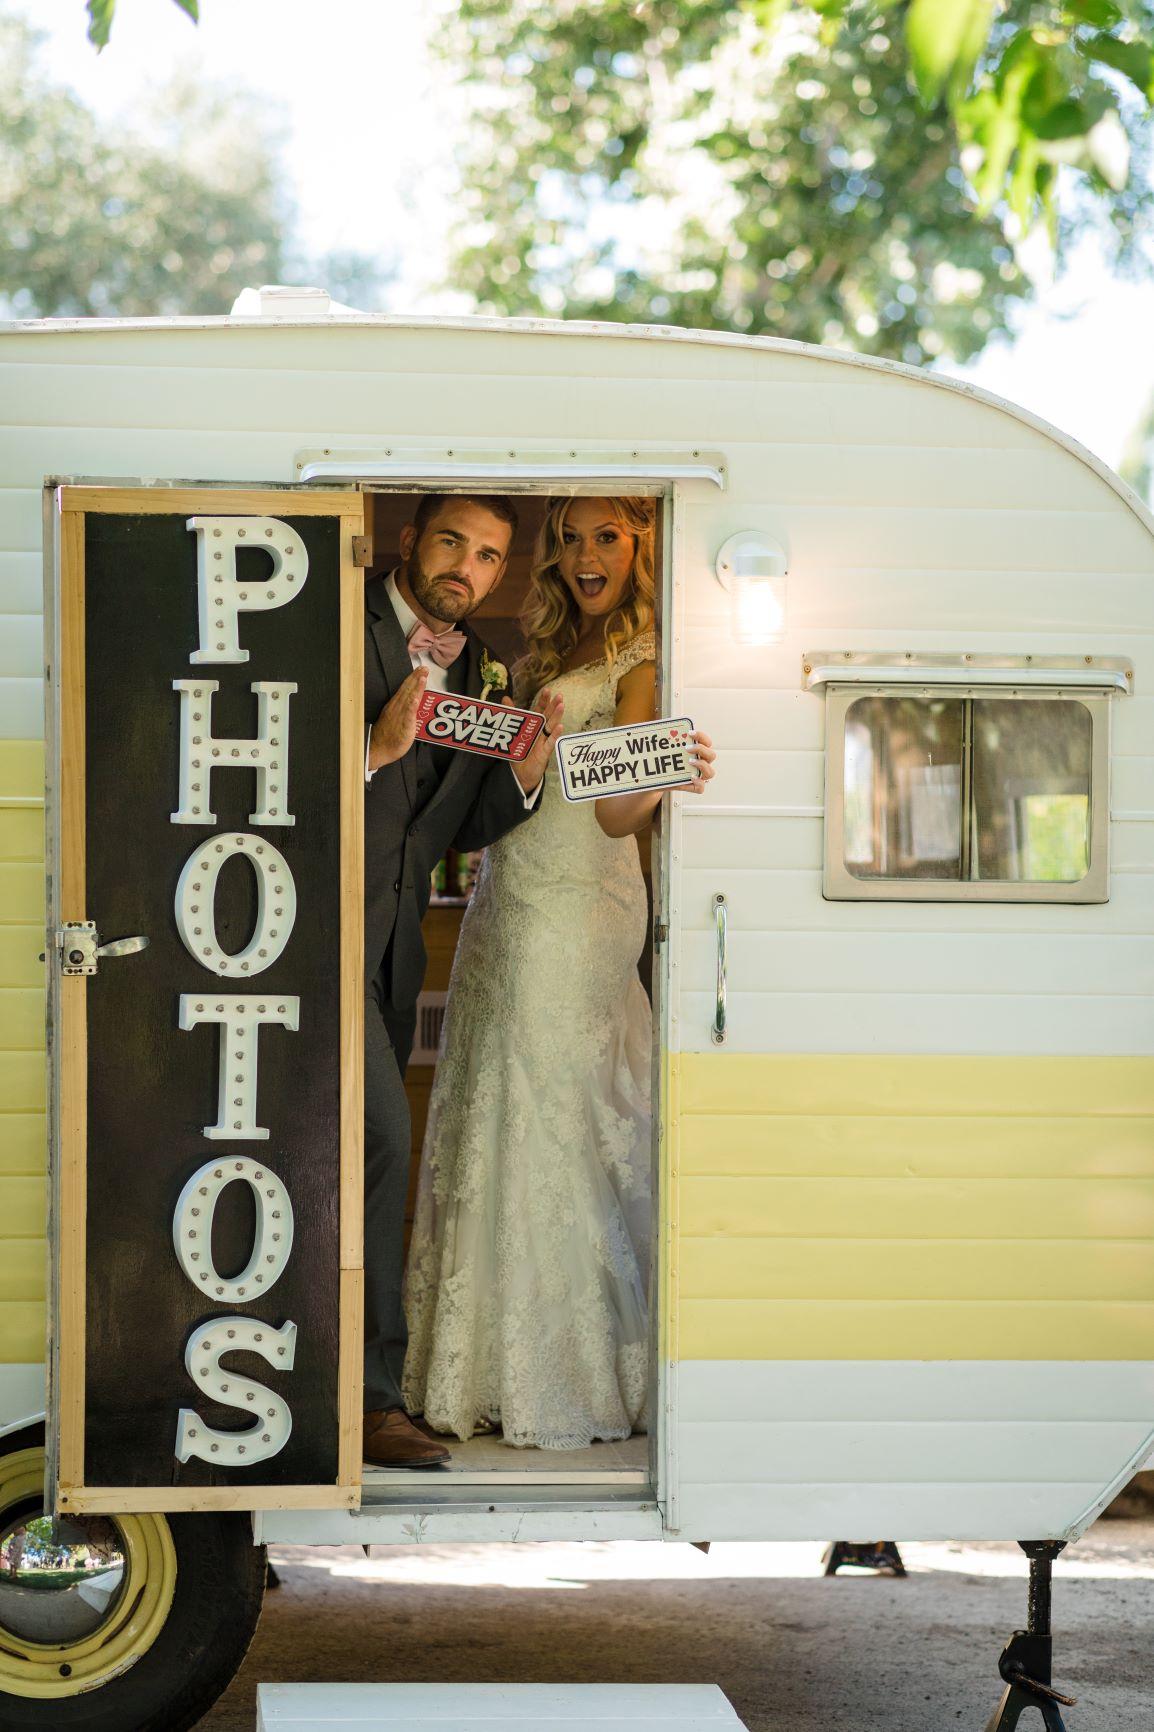 Sonoma Vintage Trailer Photo Booth